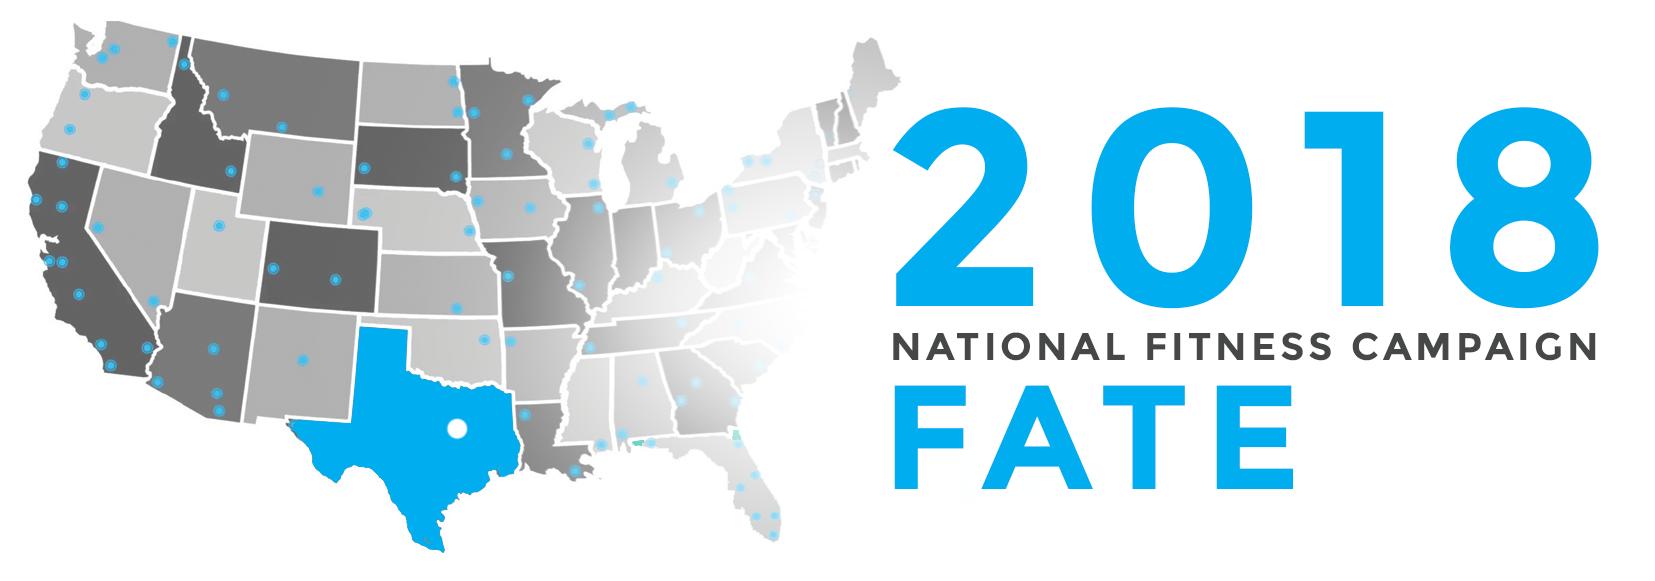 2018 Campaign Logo Fate (1).png